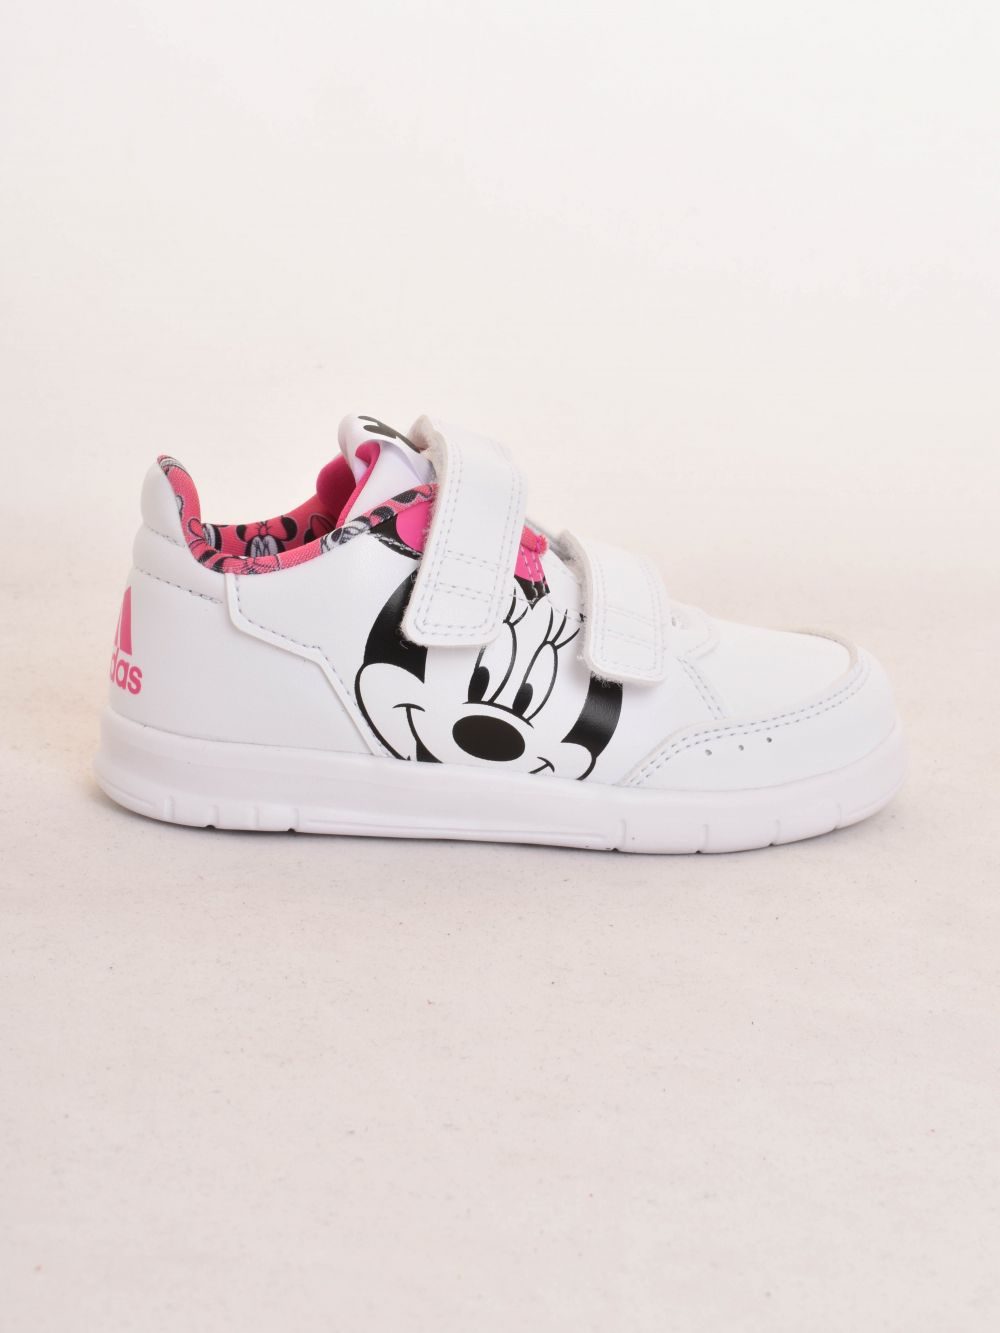 Adidas bébi lány cipő DYM&MALTASPORTCF